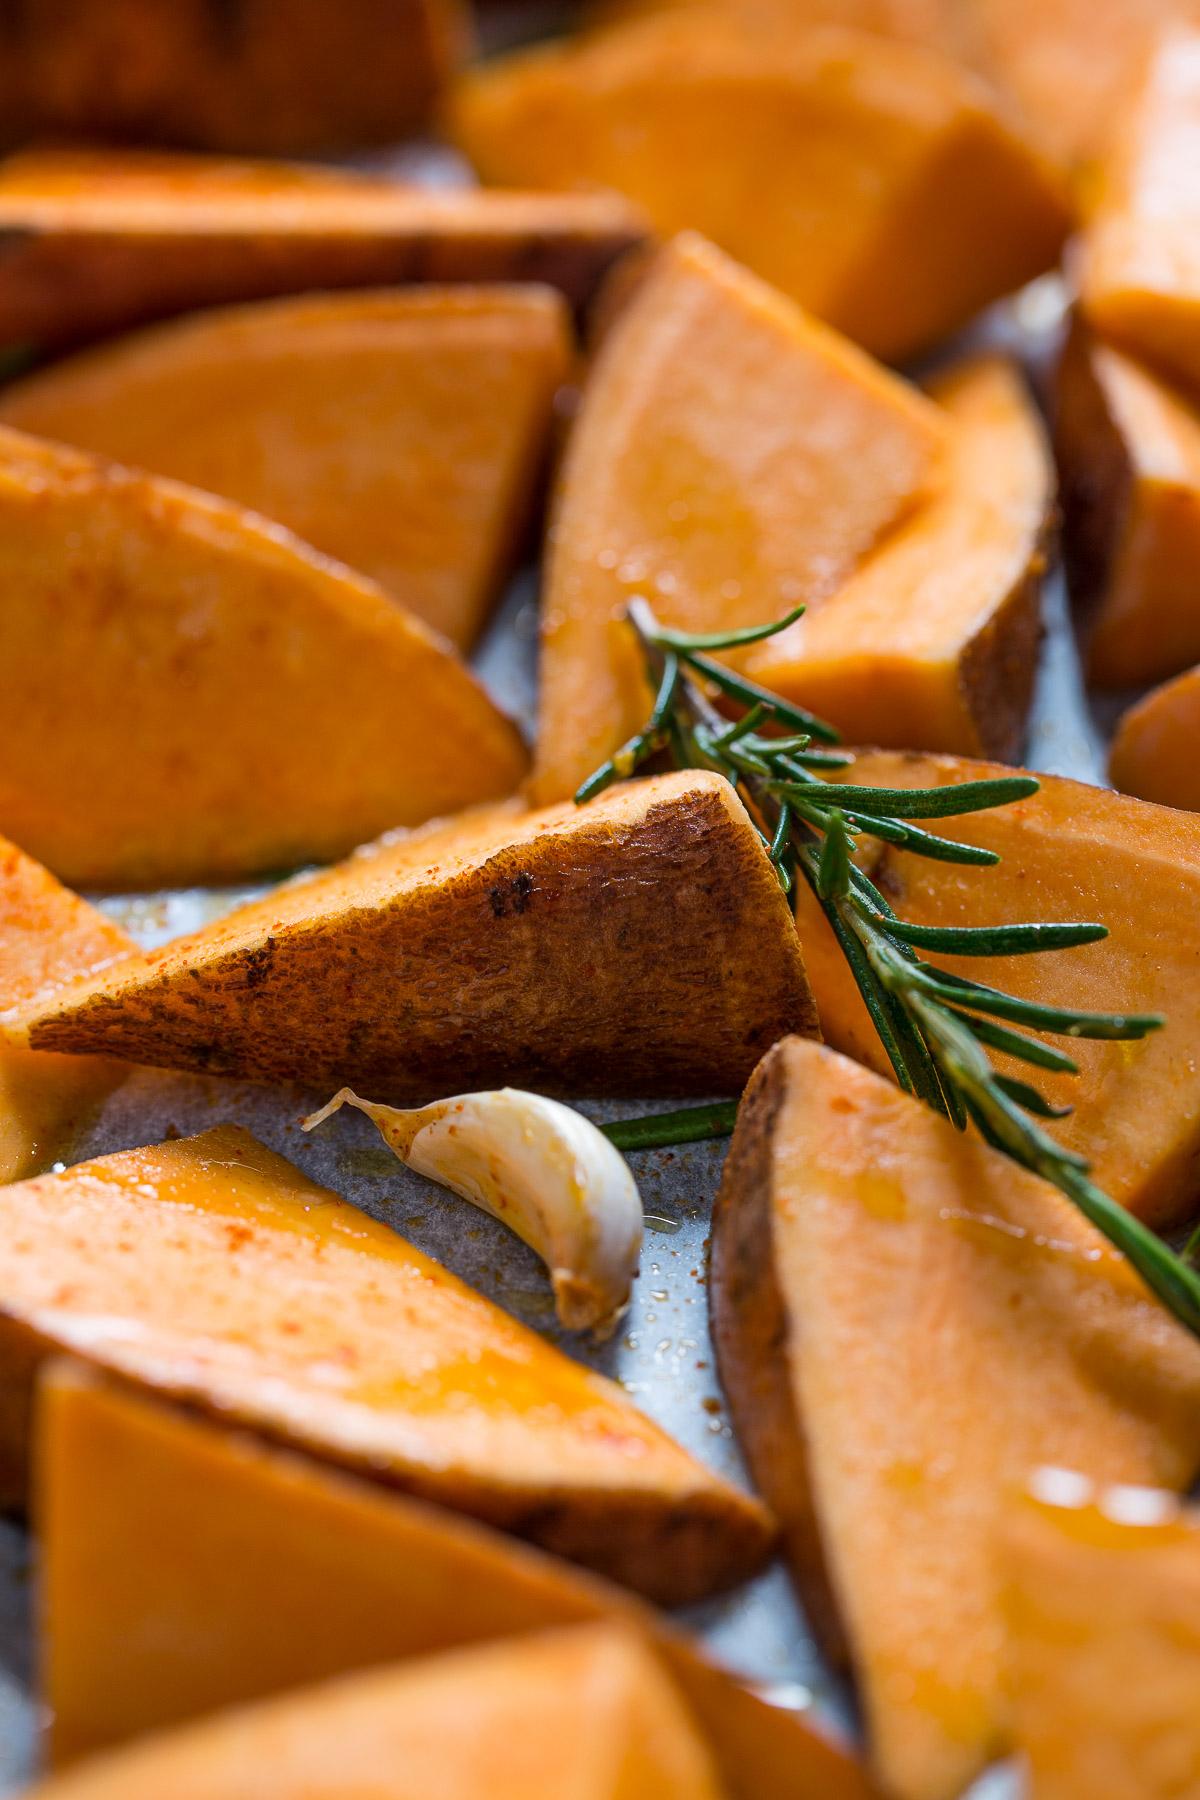 vegan-easy-falafel-with-rosemary-baked-potatoes-ricetta-falafel-non-fritti-facilissimi-con-patate-dolci-al-forno-al-rosmarino-